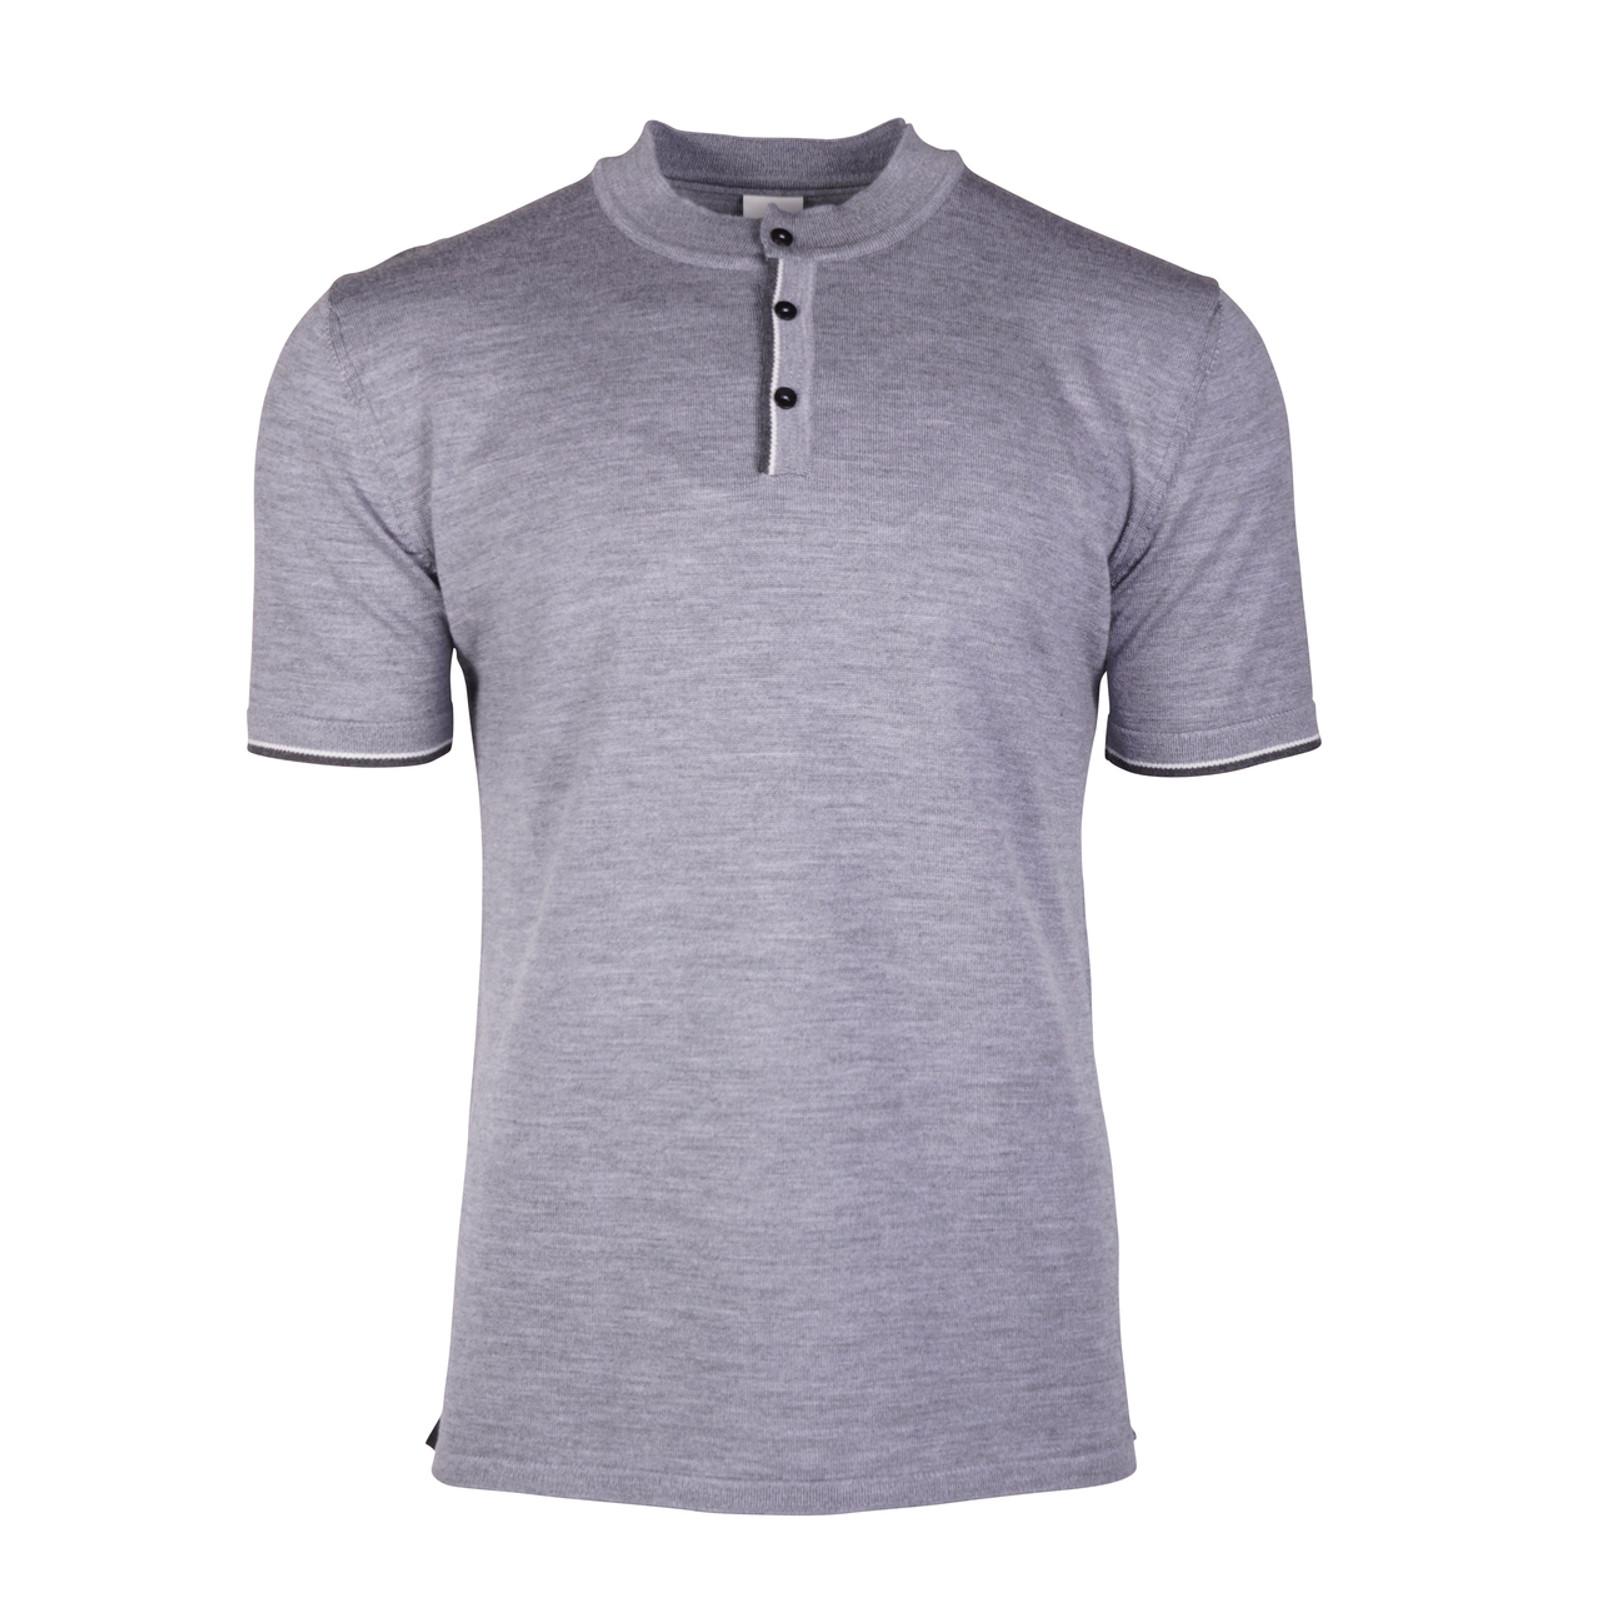 Dale of Norway Fredrik Men's T-shirt, in Smoke/Dark Charcoal/Off White, 93771-C